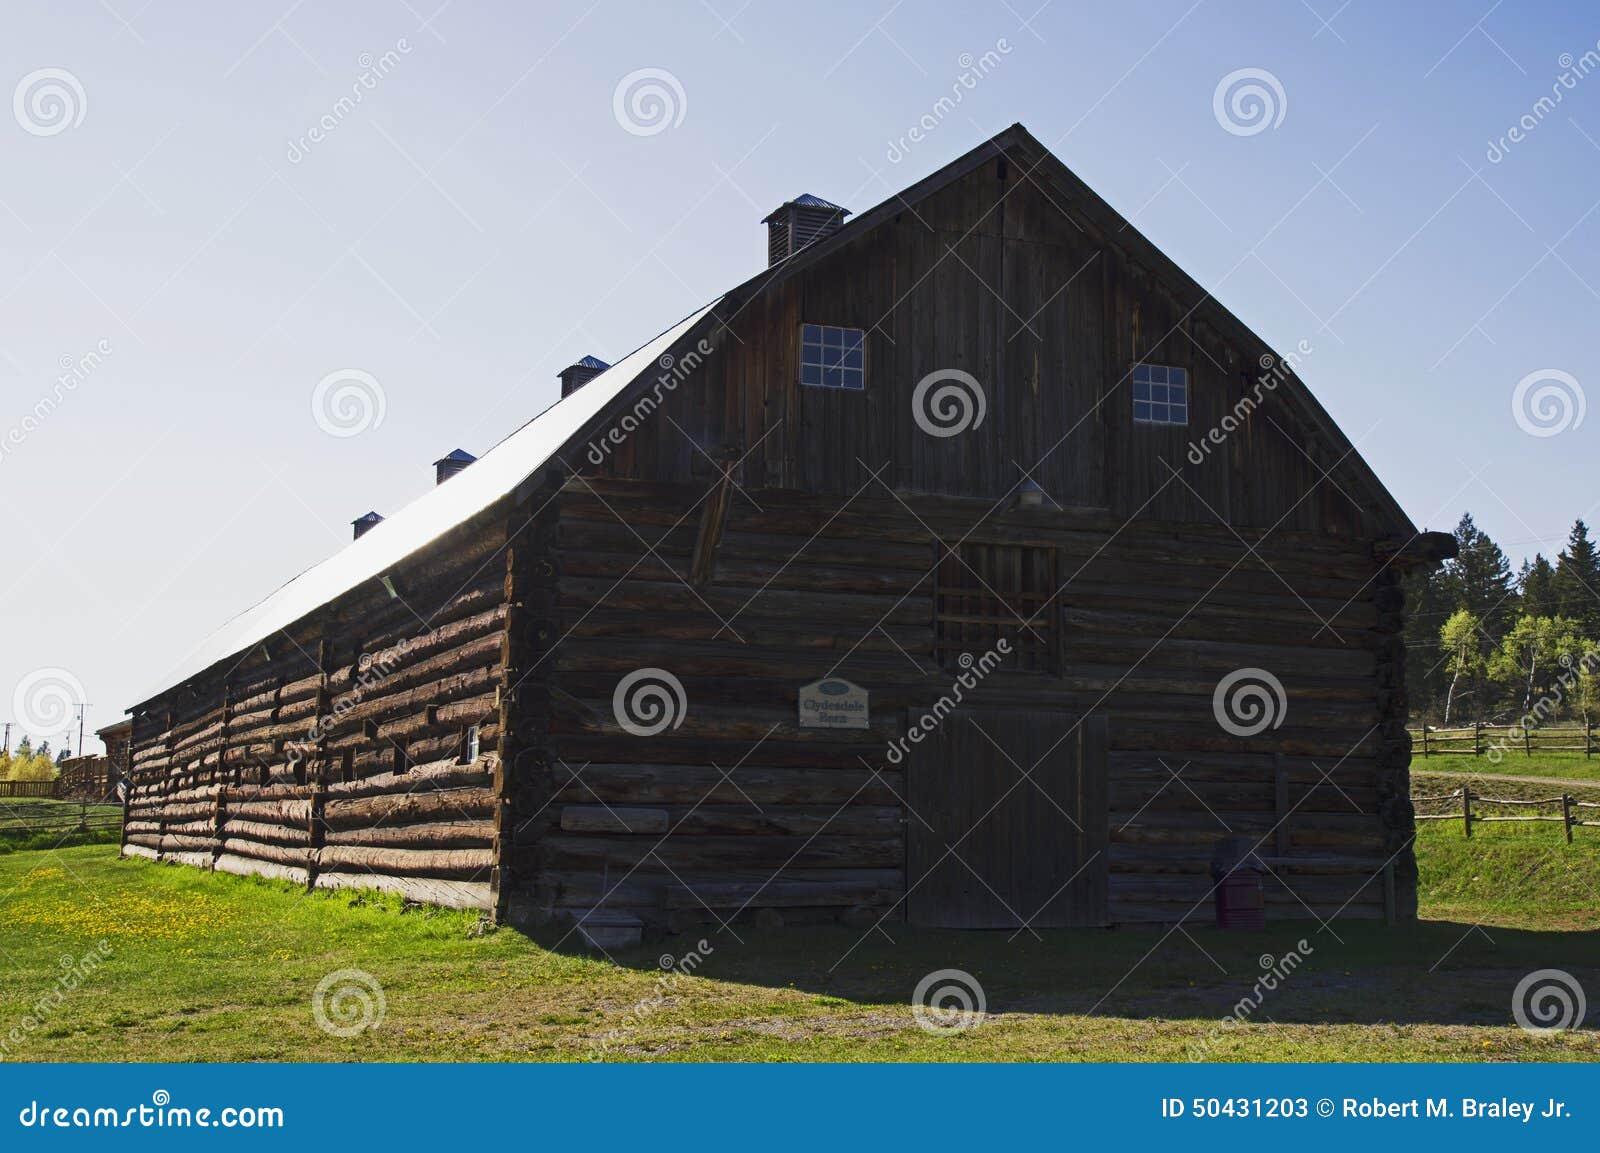 Vintage log barn